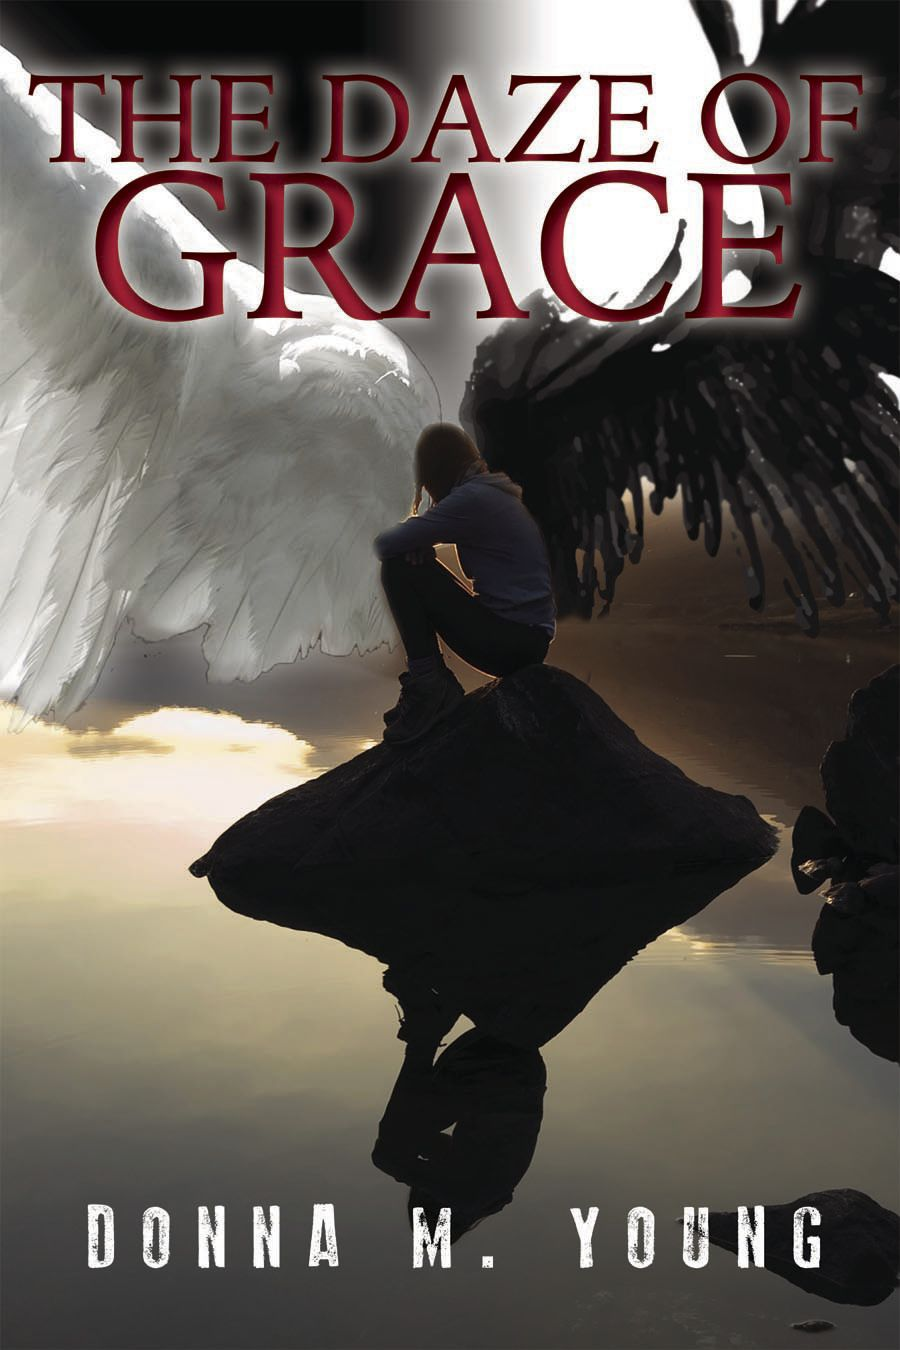 daze of grace book cover